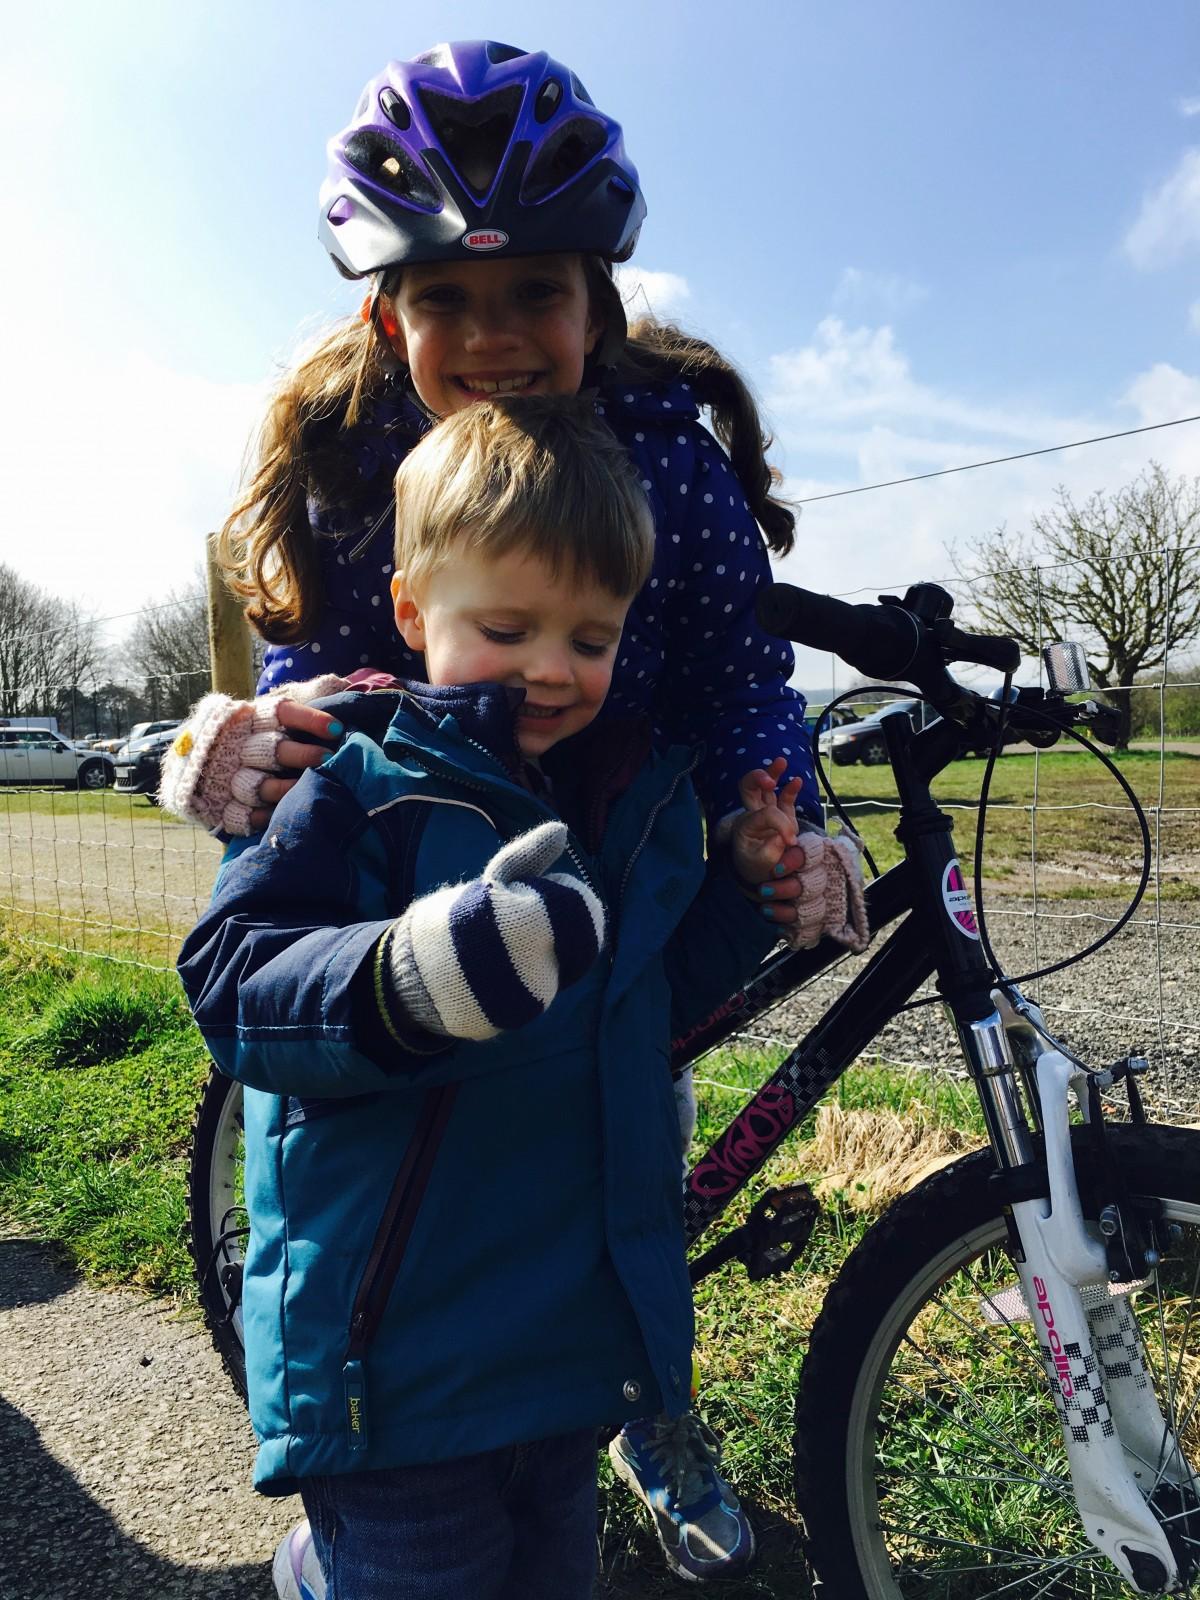 Harrogate Mama, Harrogate mums, Ripley Bike ride, Ripley, kids bike ride Harrogate, IMG_8675